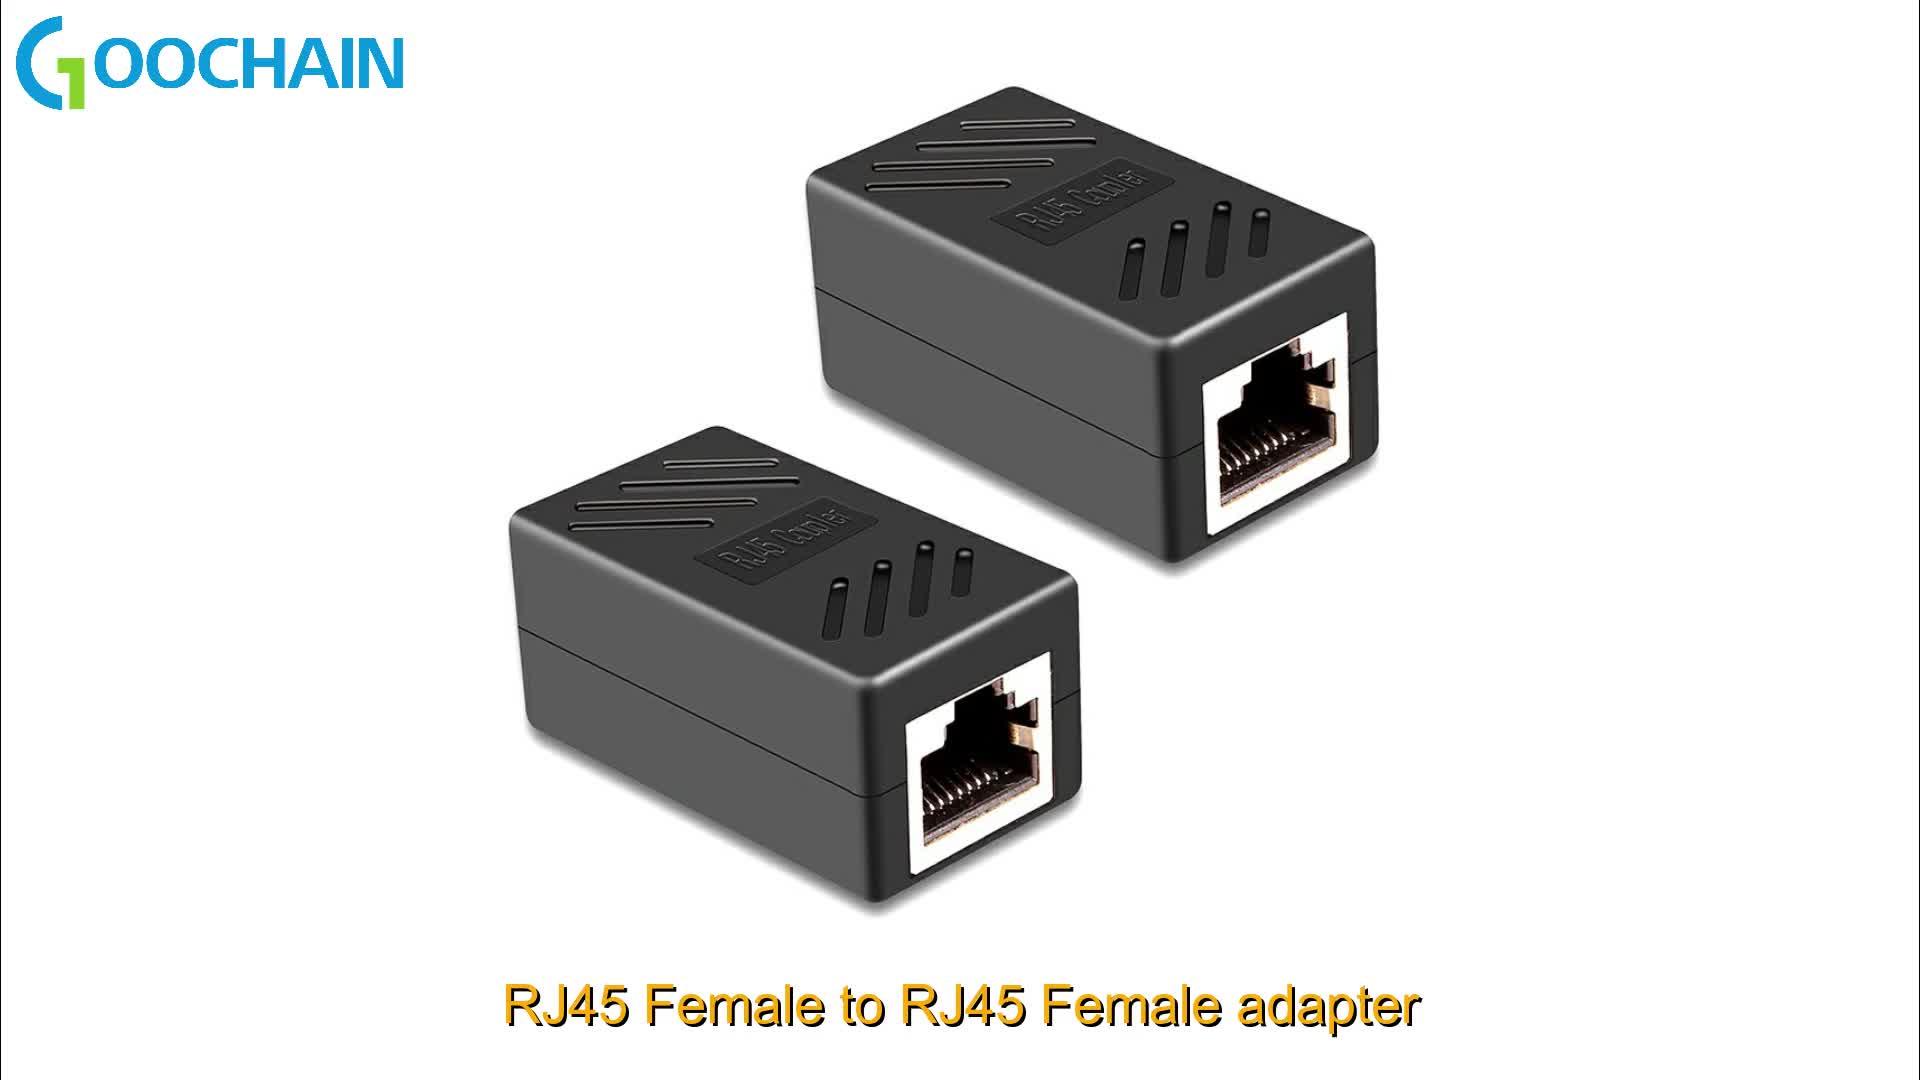 RJ45 8P8C 1 Maschio a 2 Femmina Y Splitter Lan di Estensione di rete Ethernet Cavo adattatore Compatibile con Cat5, cat5e, Cat6, Cat7